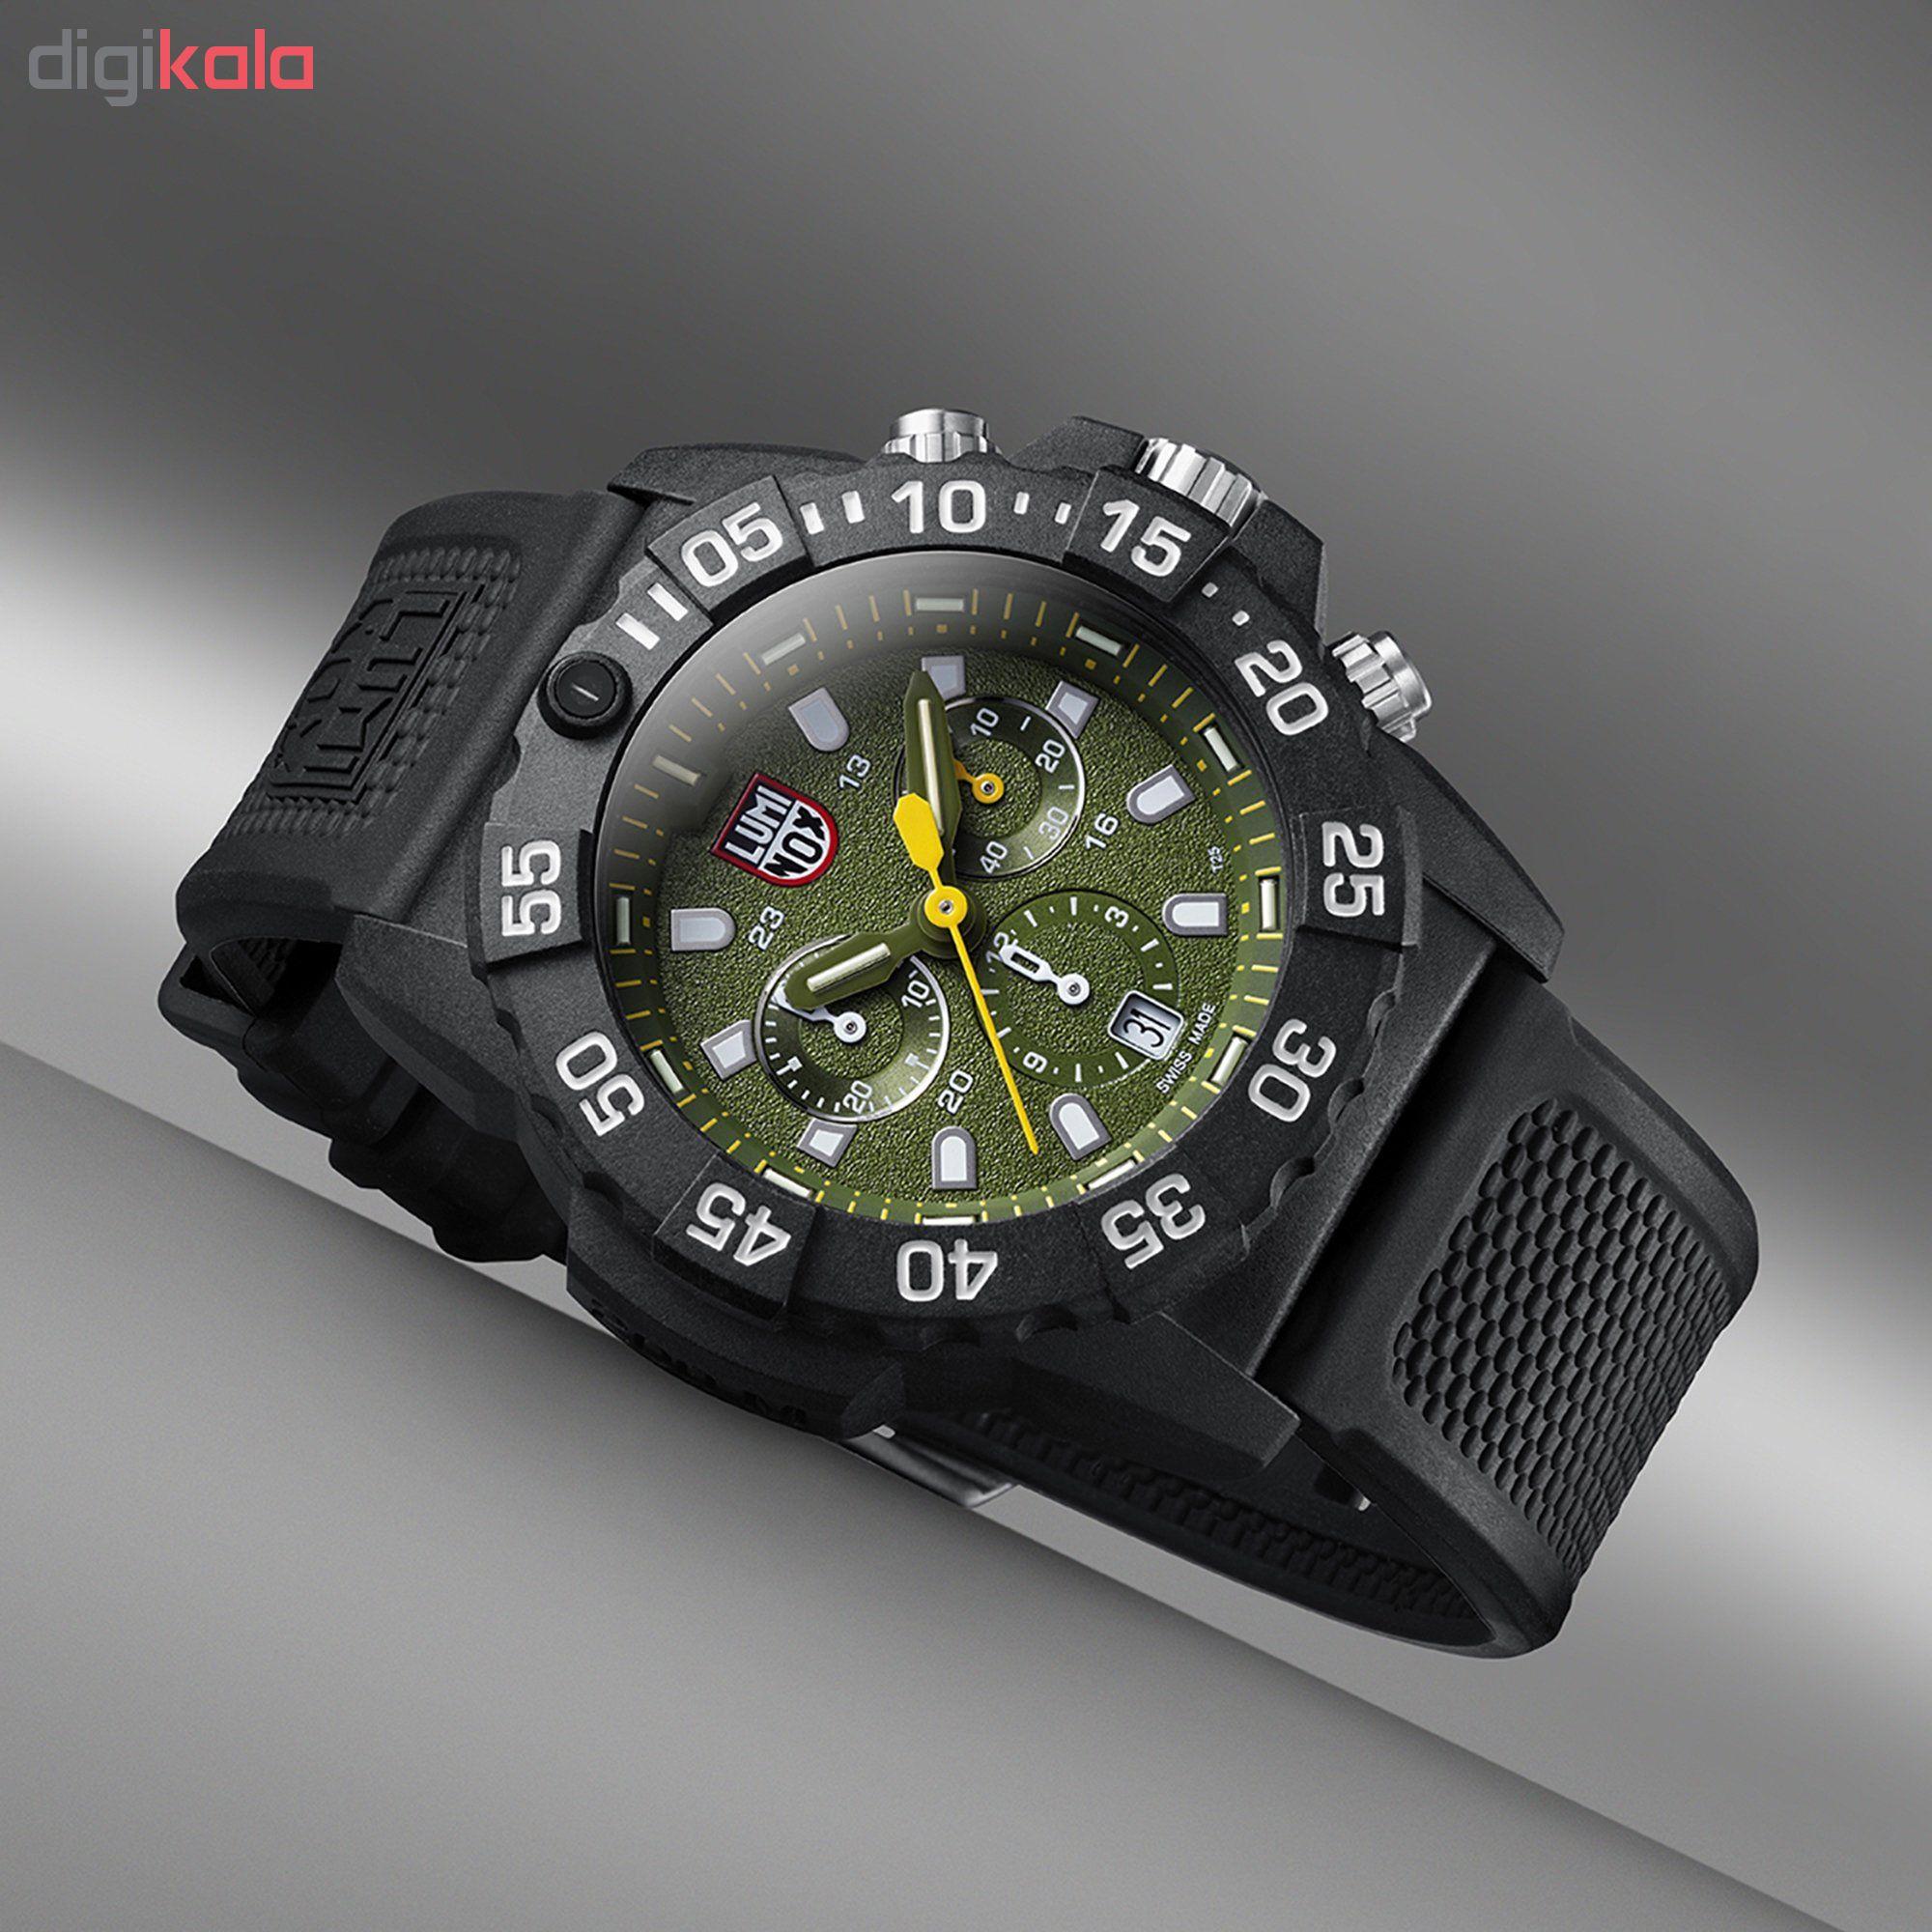 خرید ساعت مچی عقربه ای مردانه لومیناکس مدل XS.3597